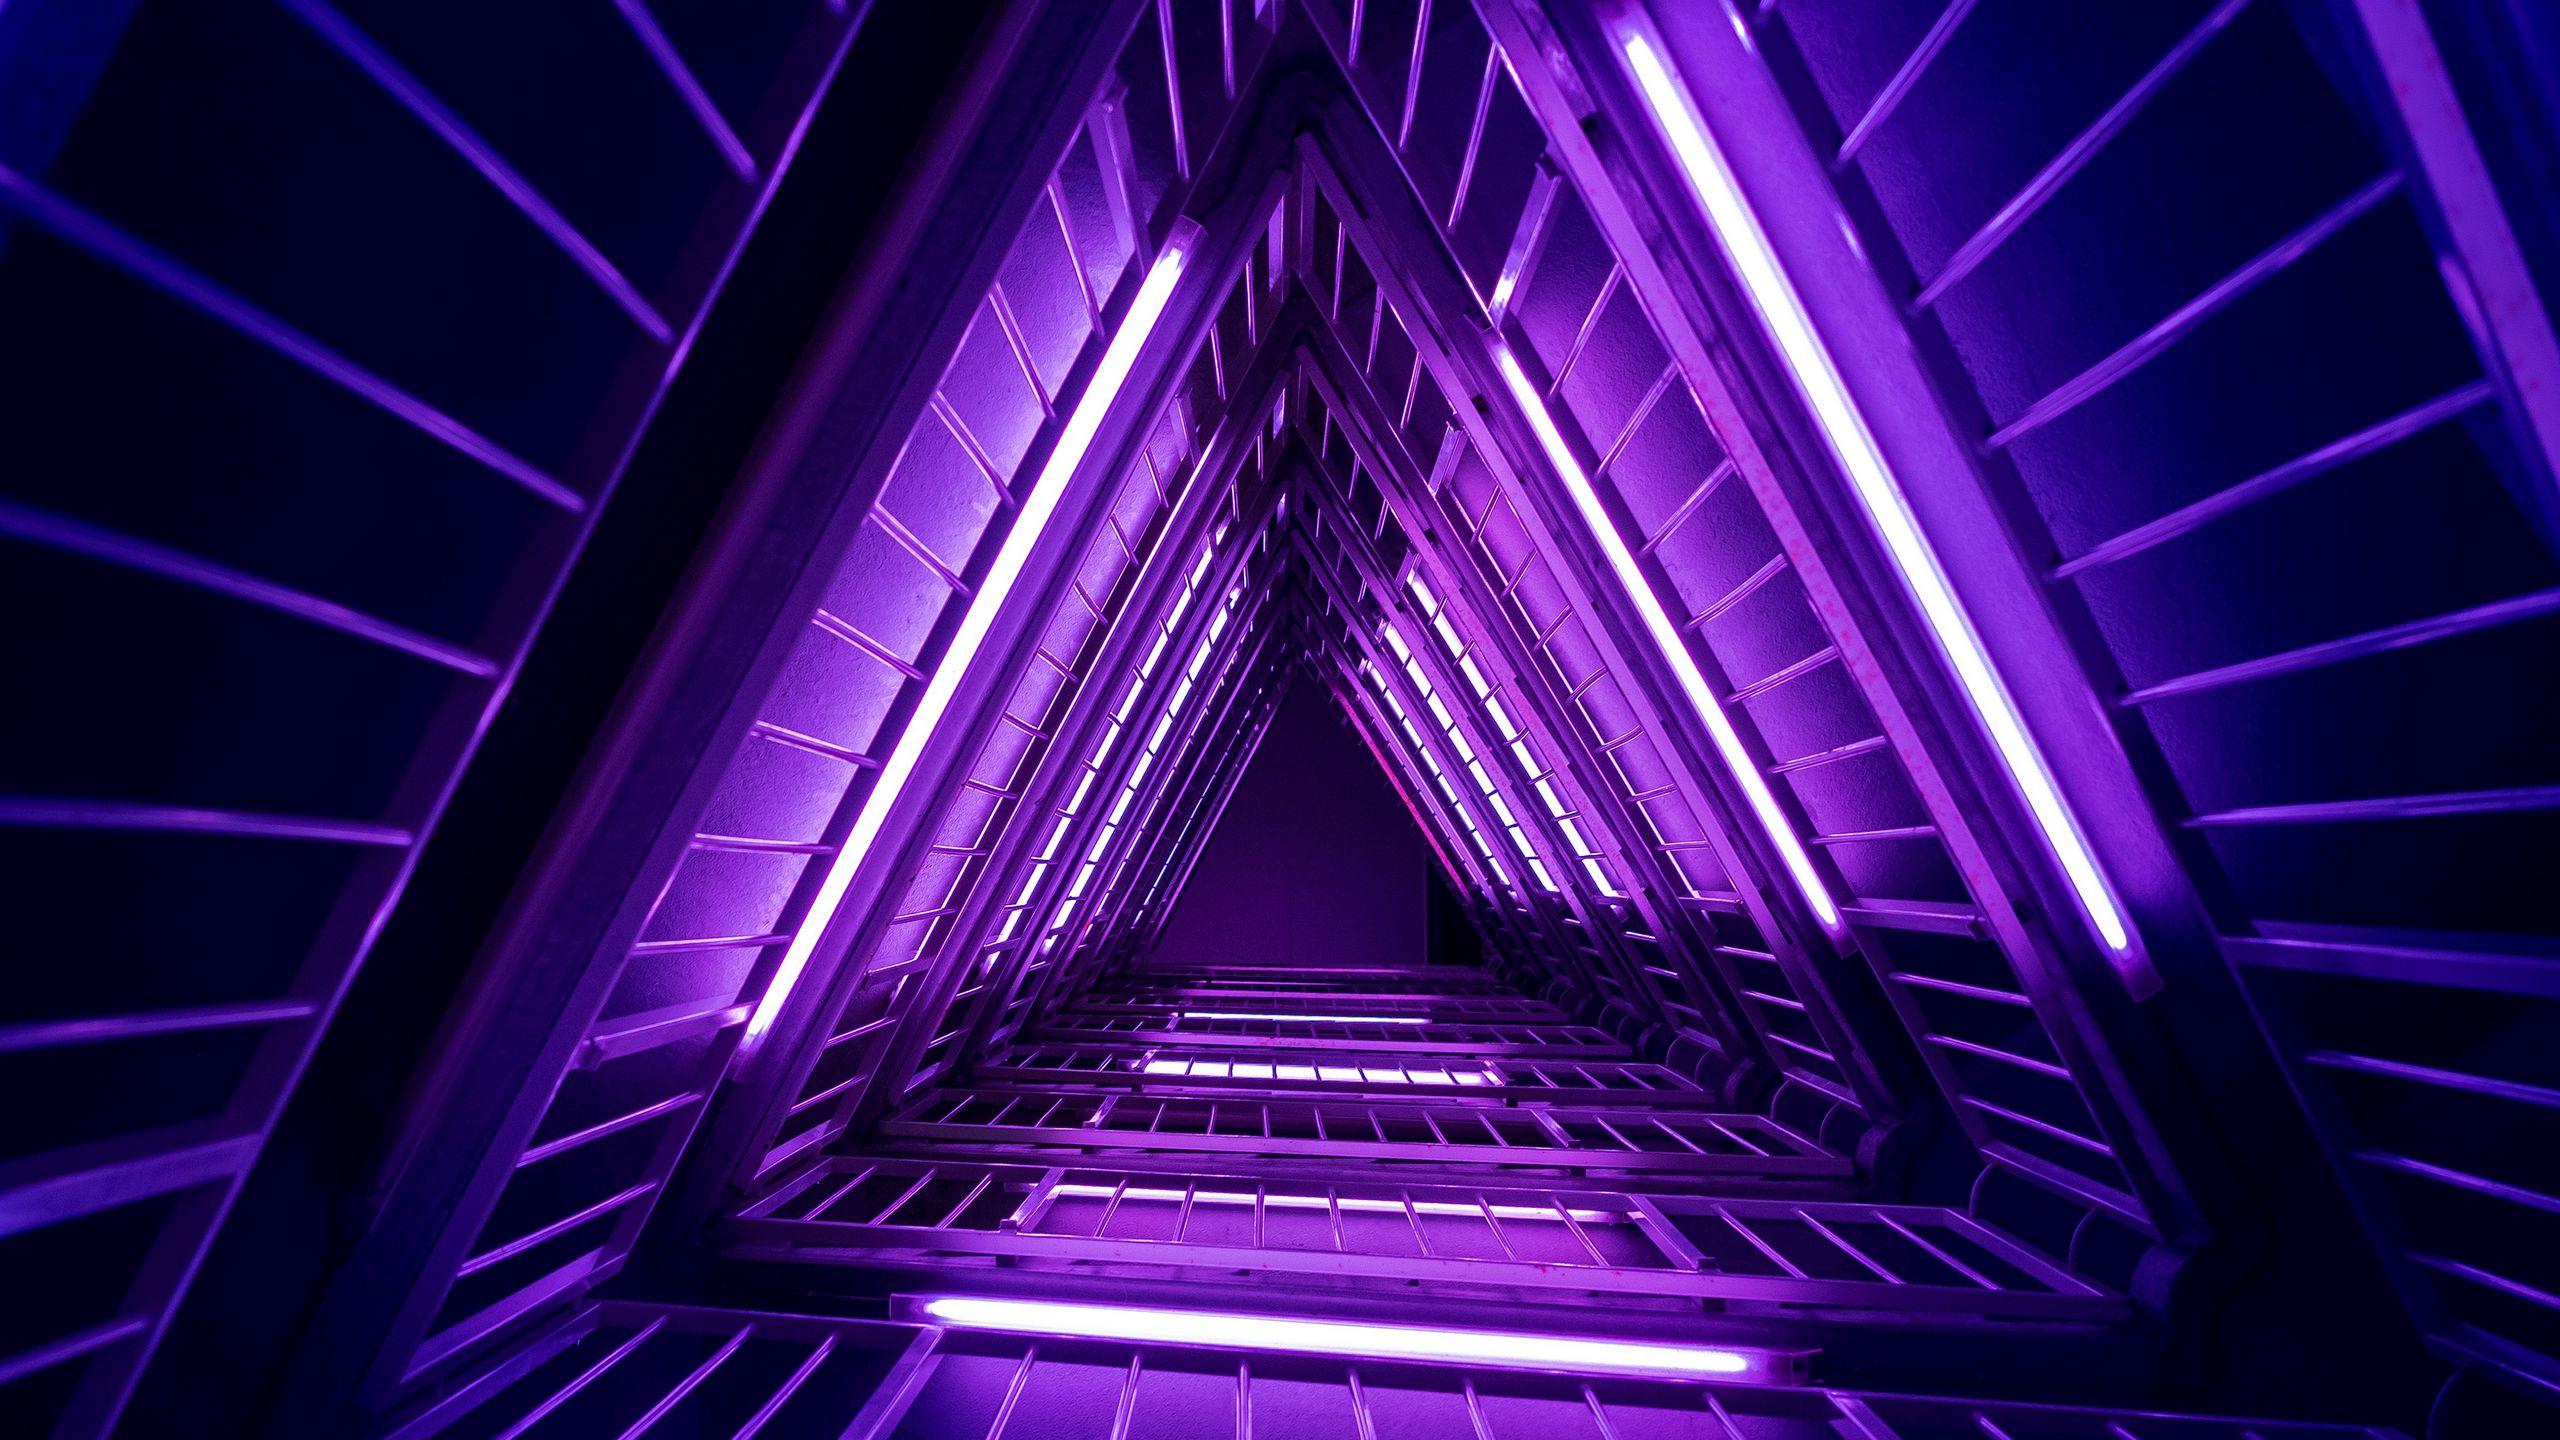 2560x1440 Wallpaper ladder, purple, light